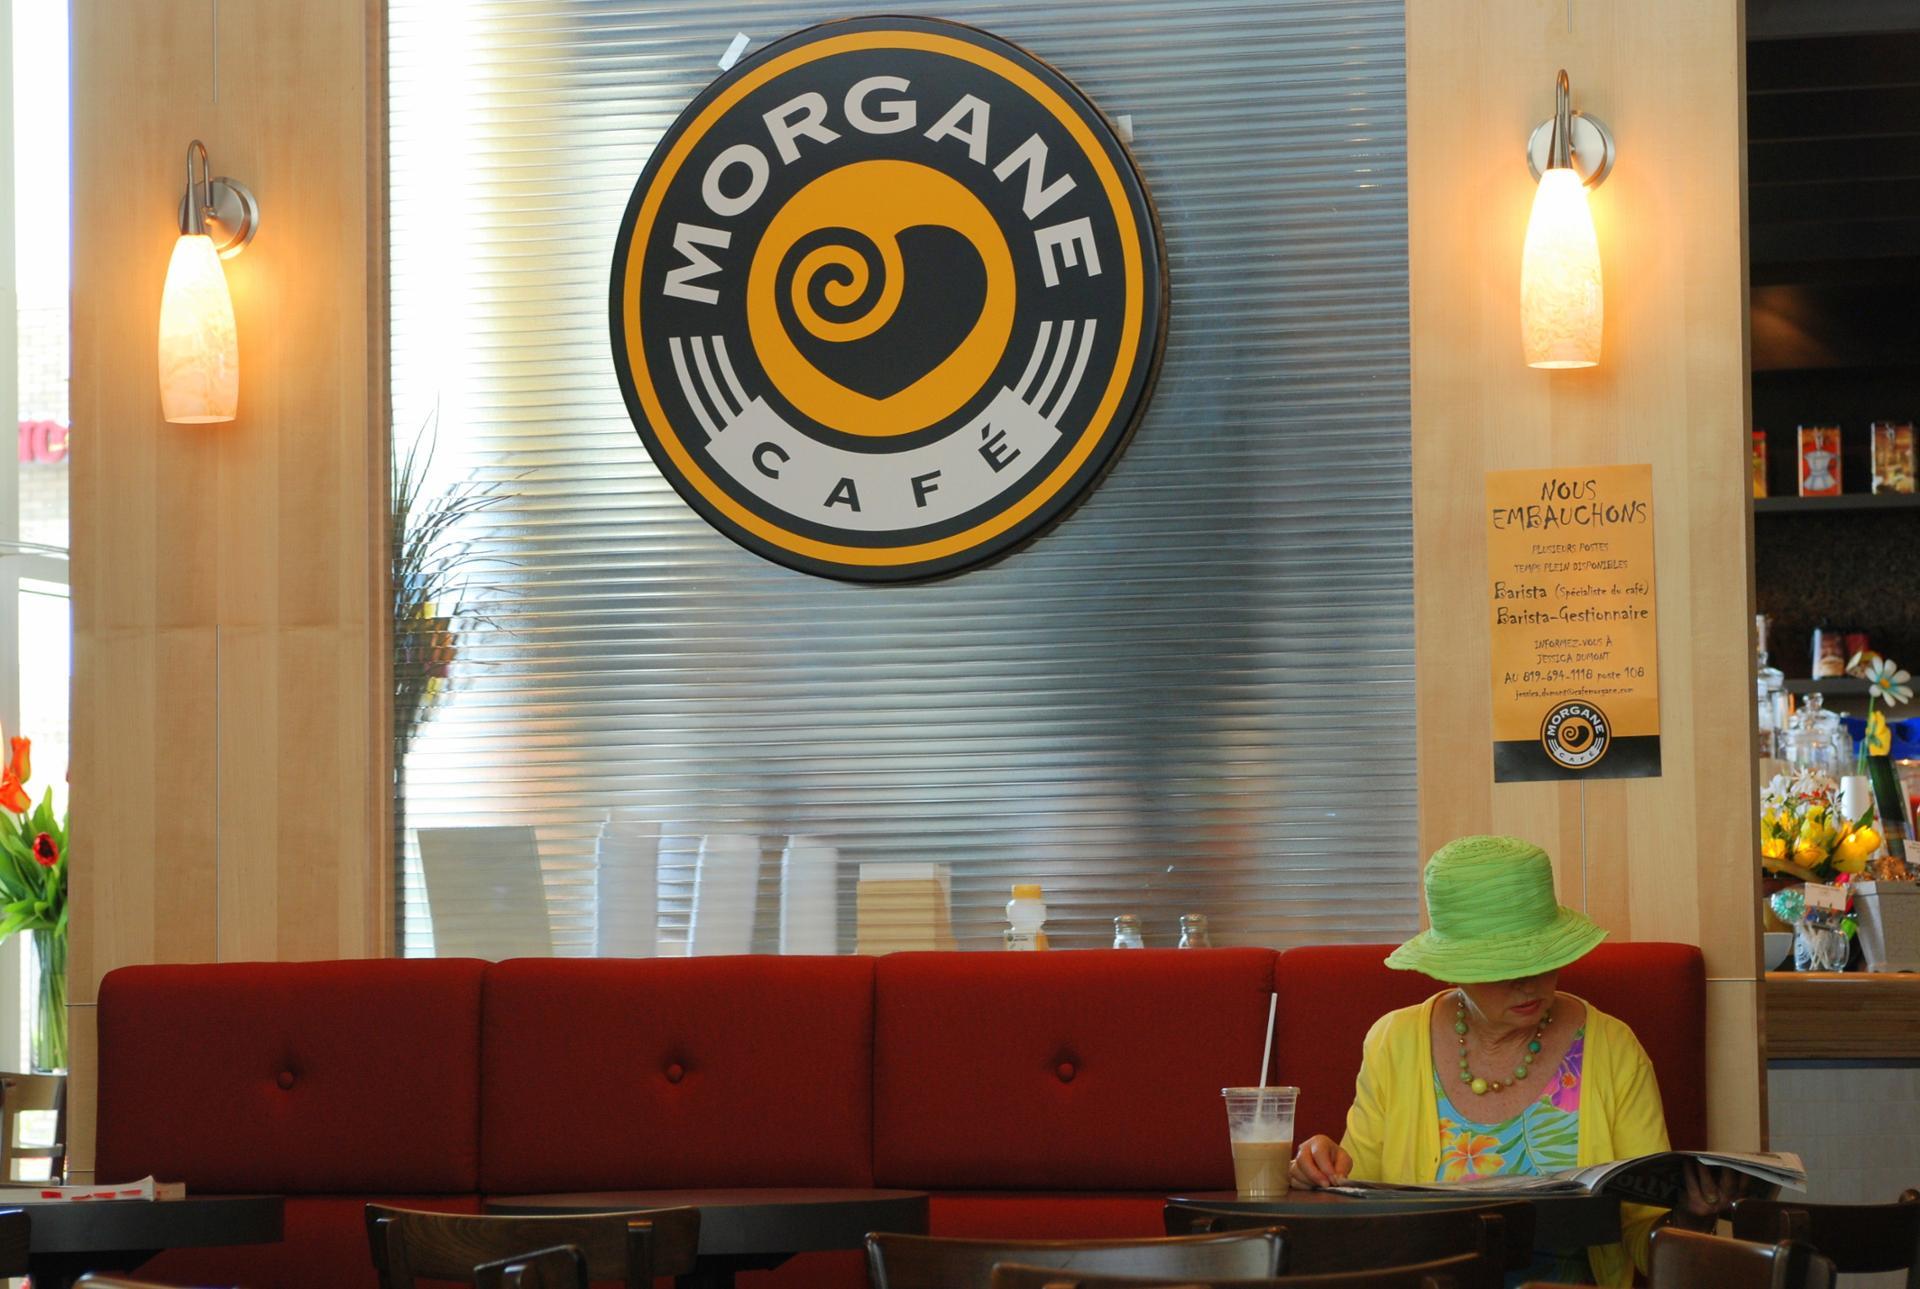 Morgane Café.